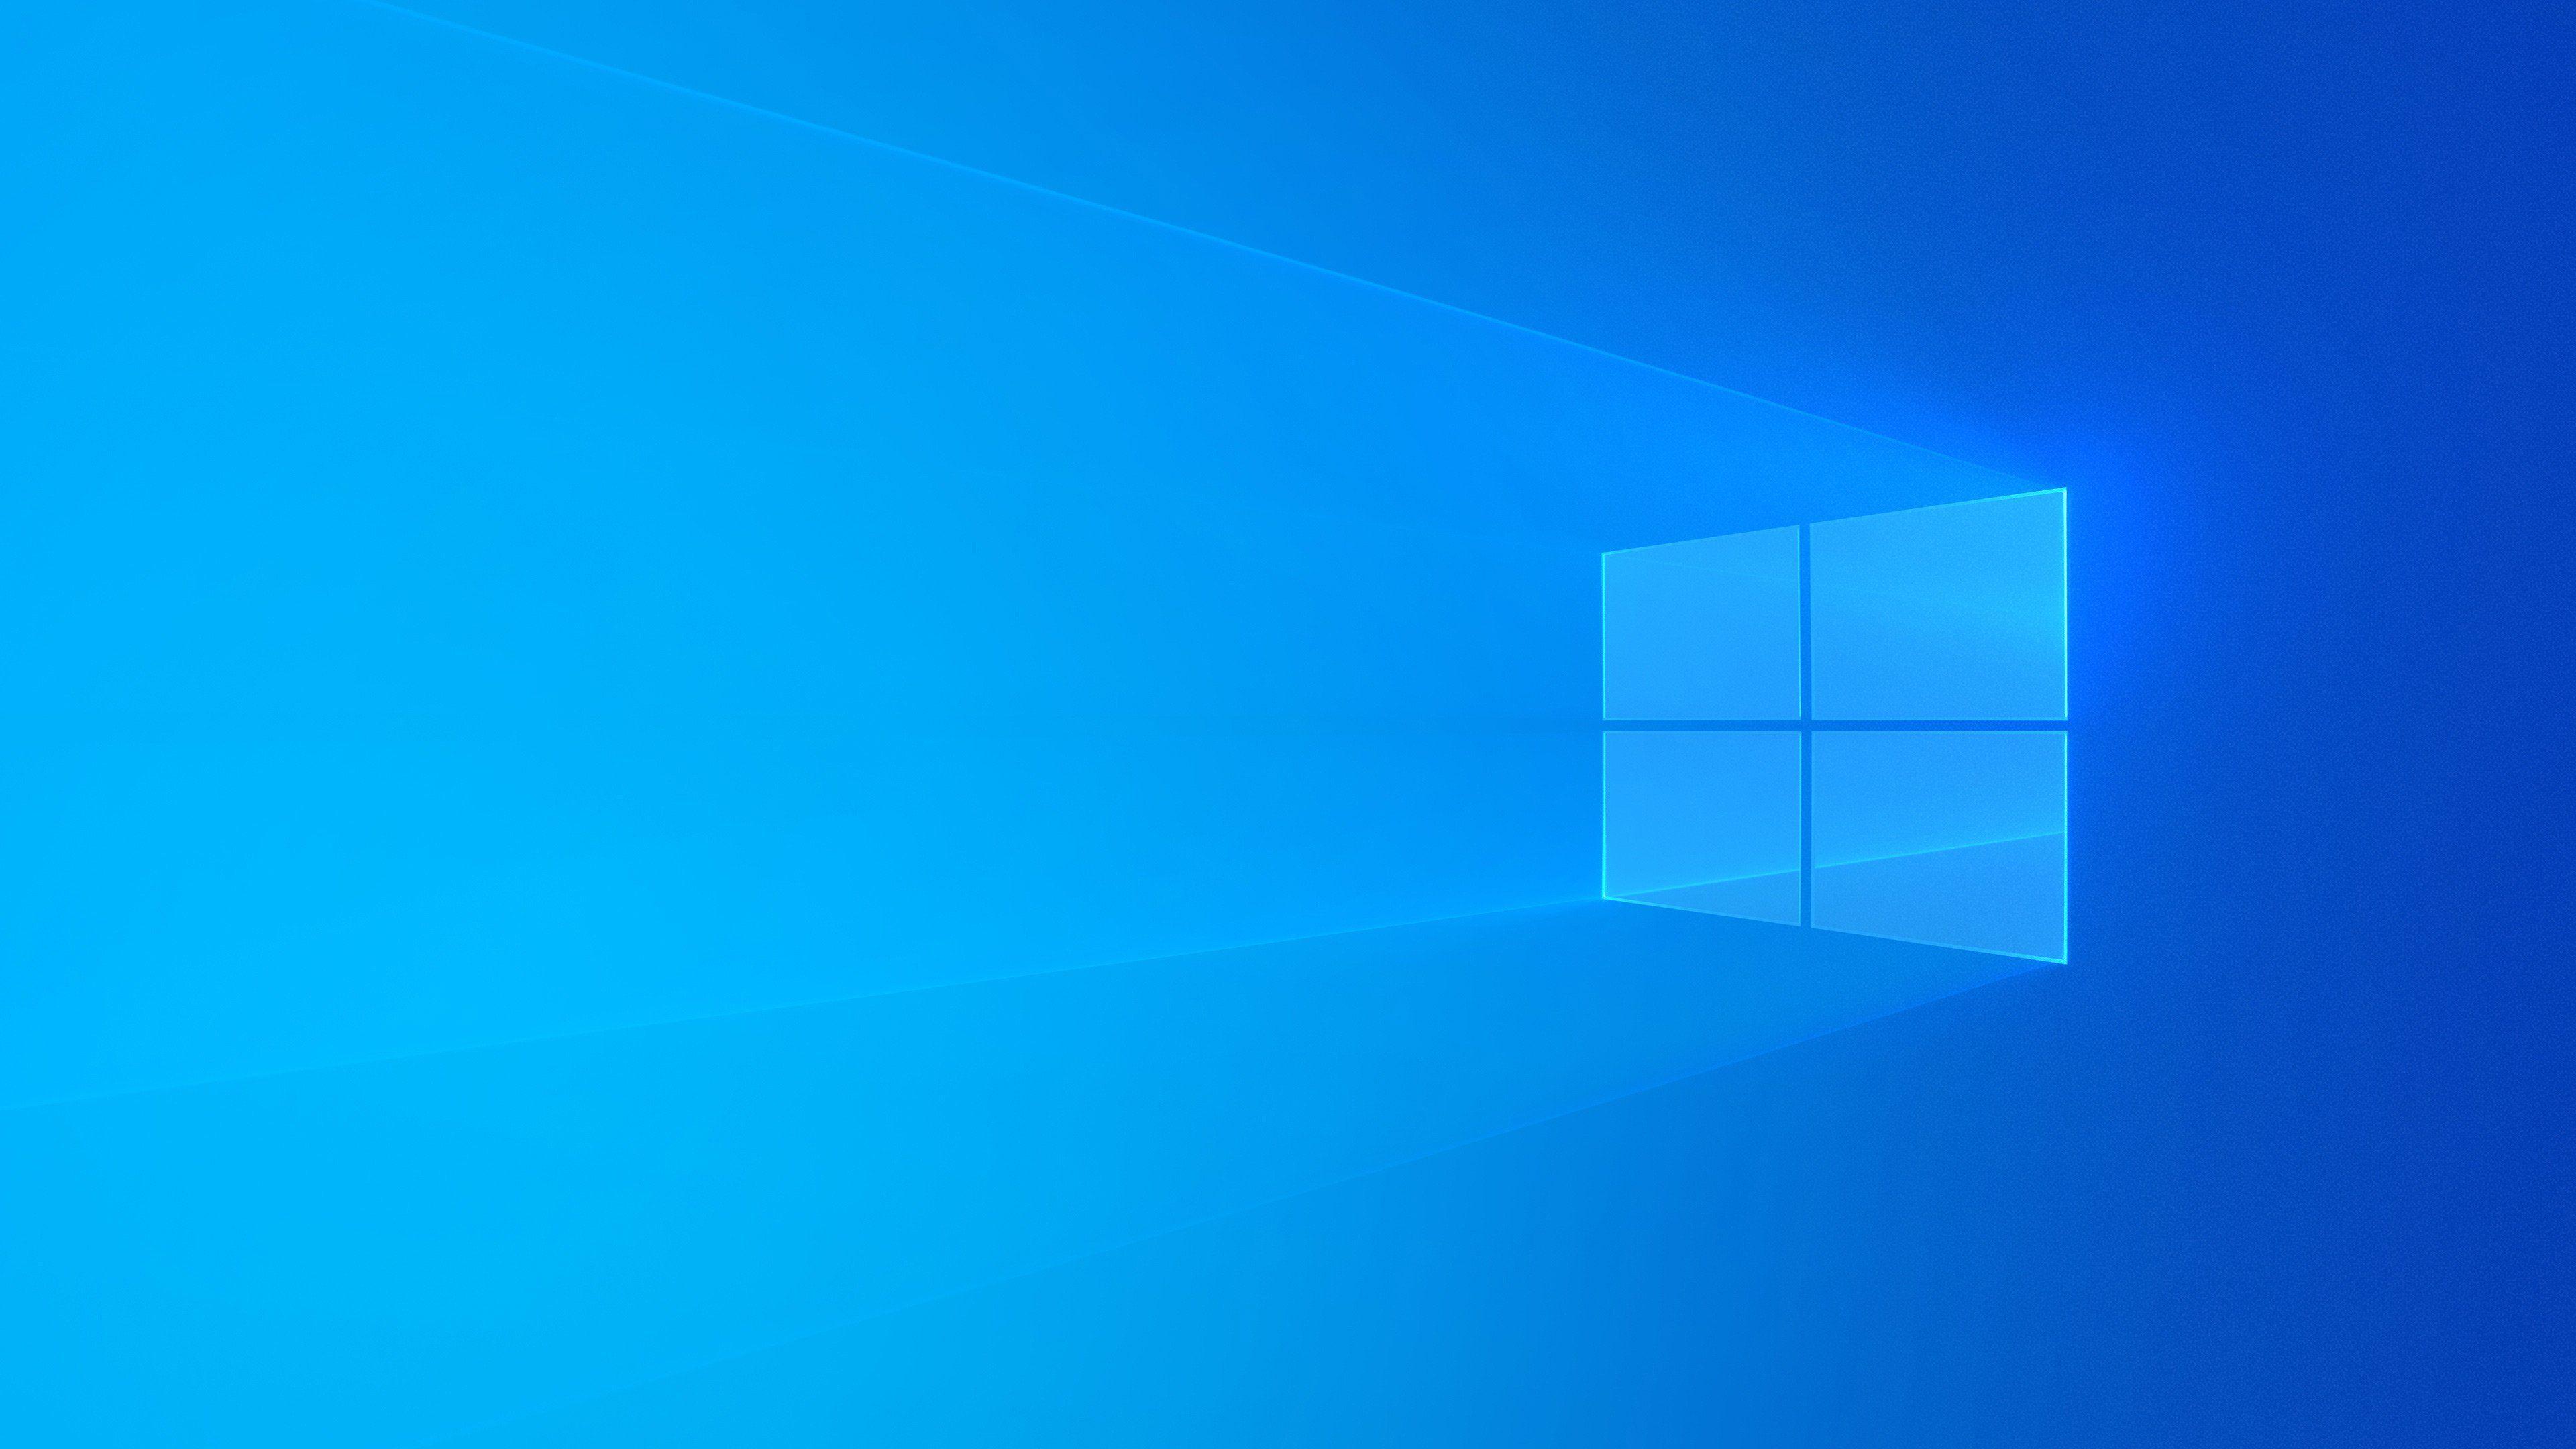 New Windows 10 Light Theme Wallpaper Windows 10 Wallpaper Windows 10 Microsoft Windows